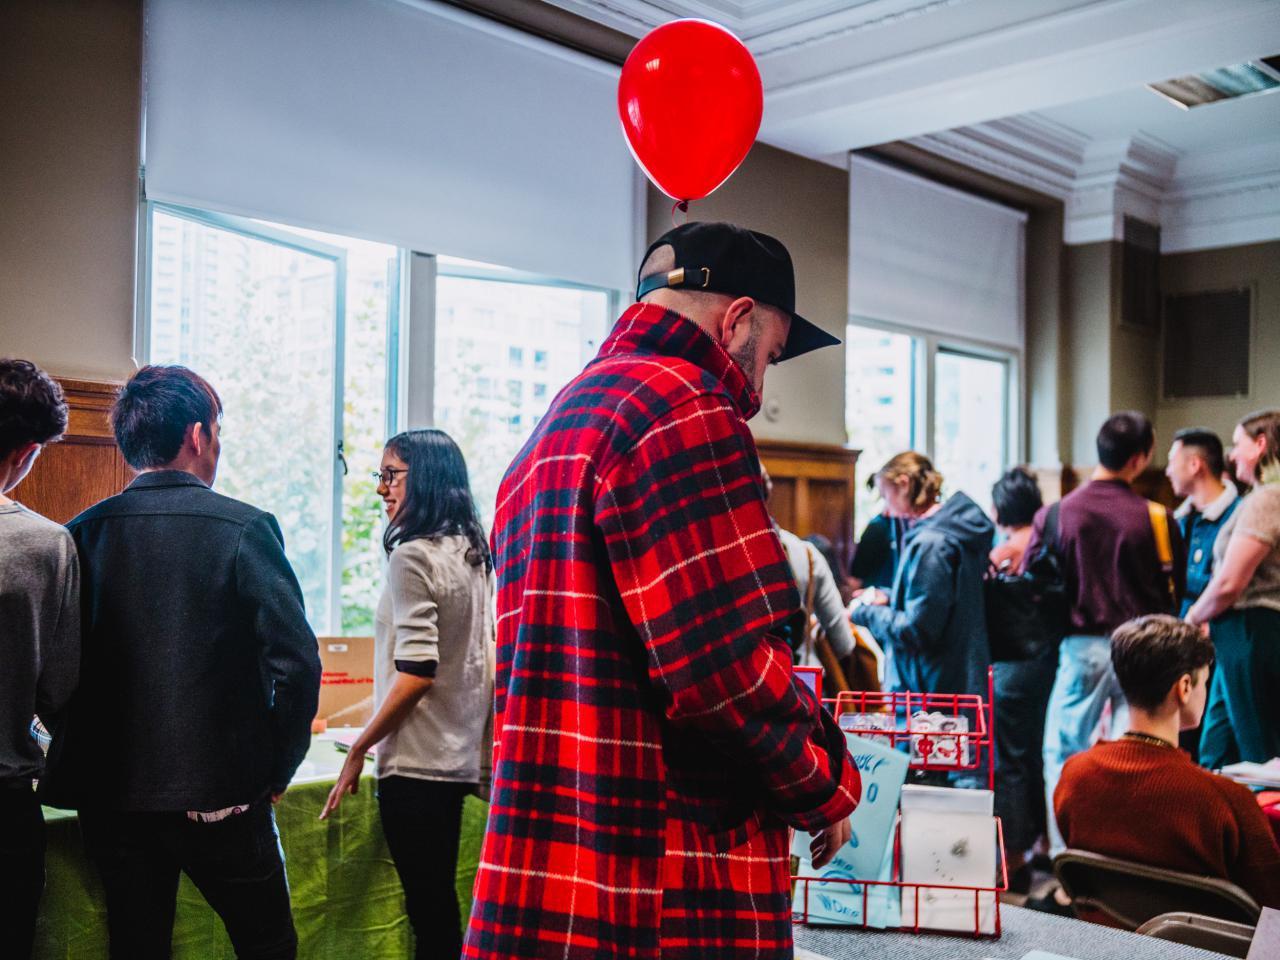 Vancouver-Book-Fair-2017-Saman-Shariati-6.jpg